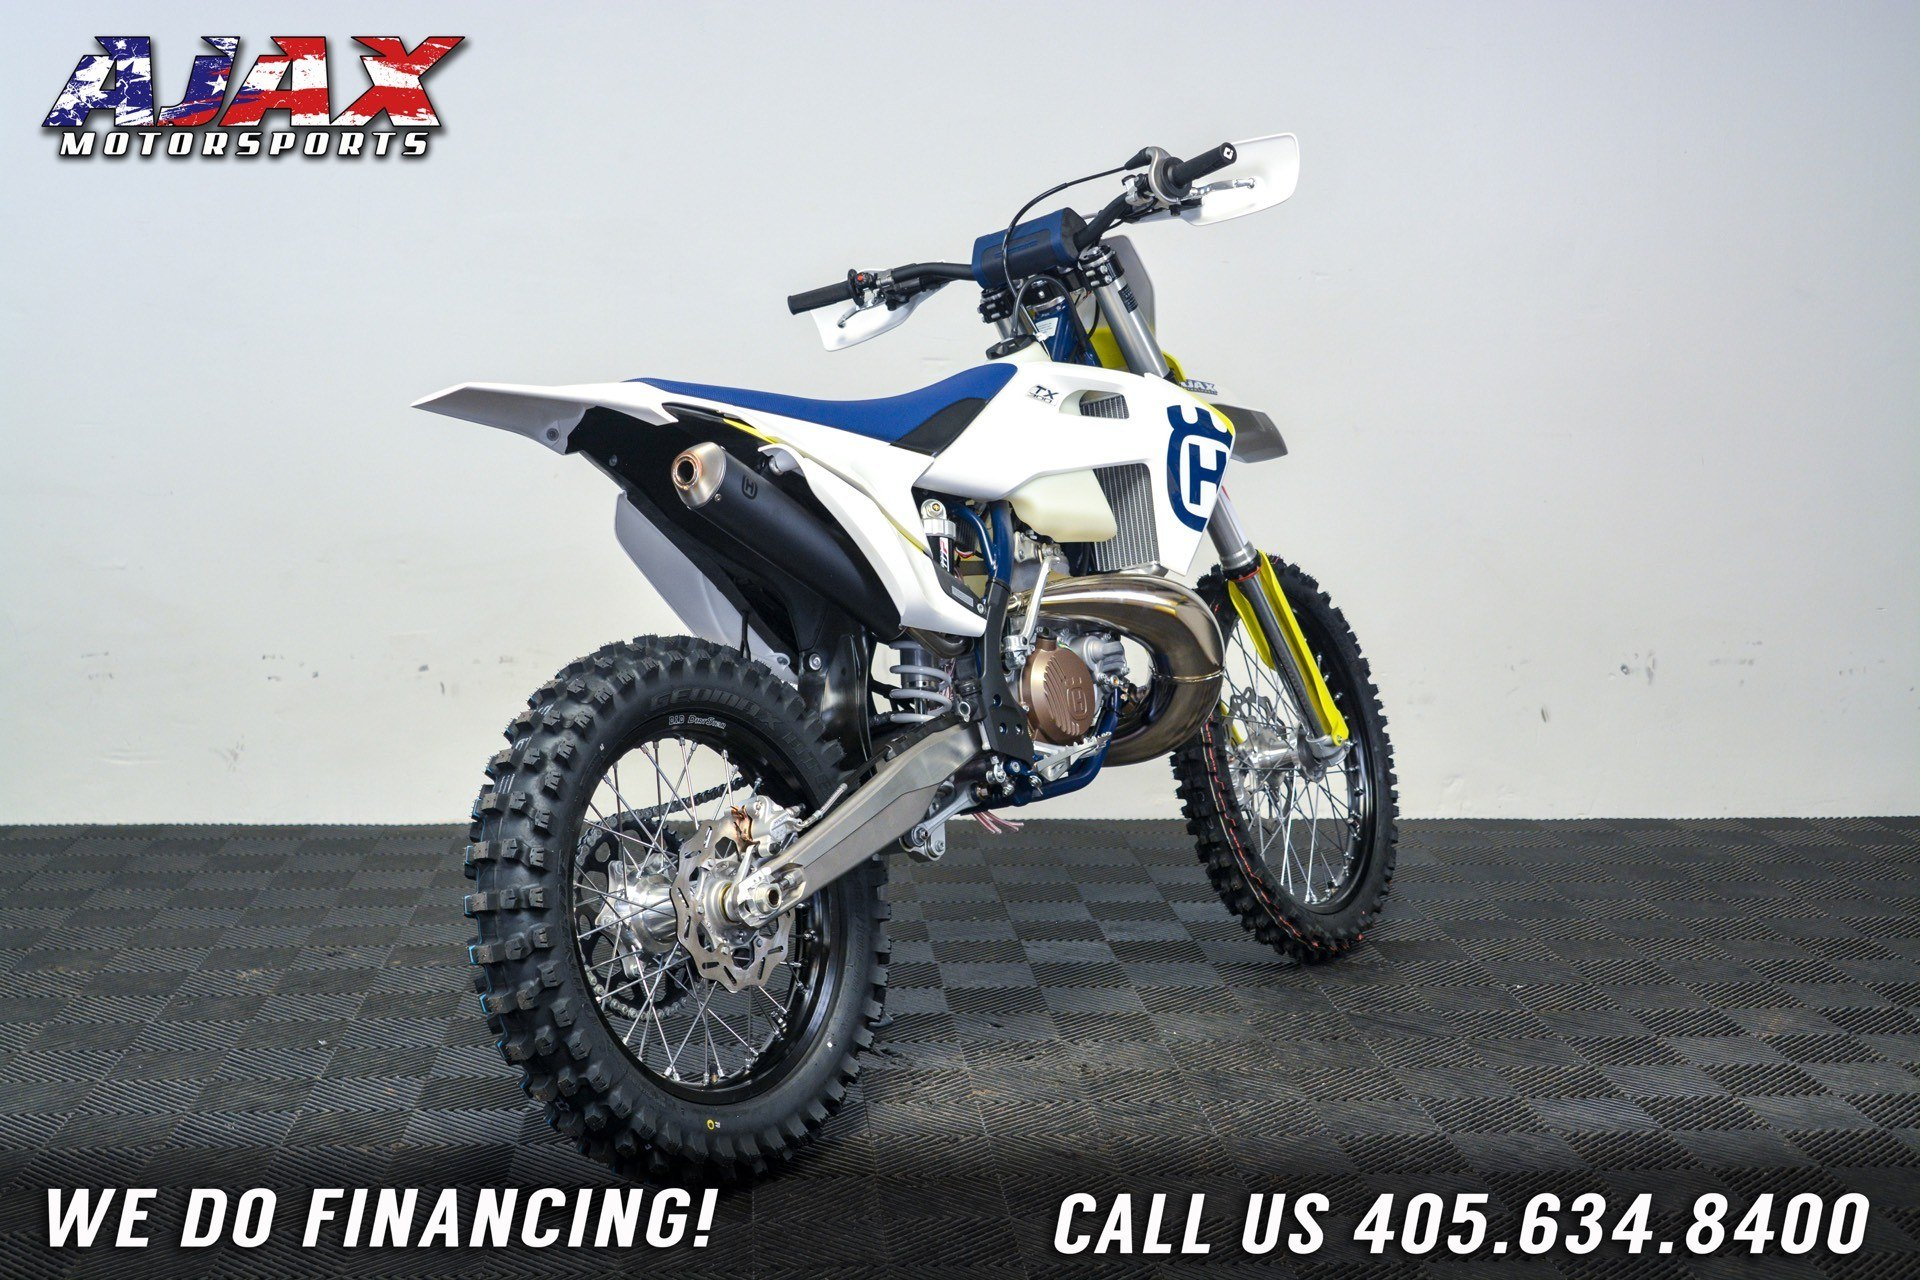 2019 Husqvarna TX 300 5